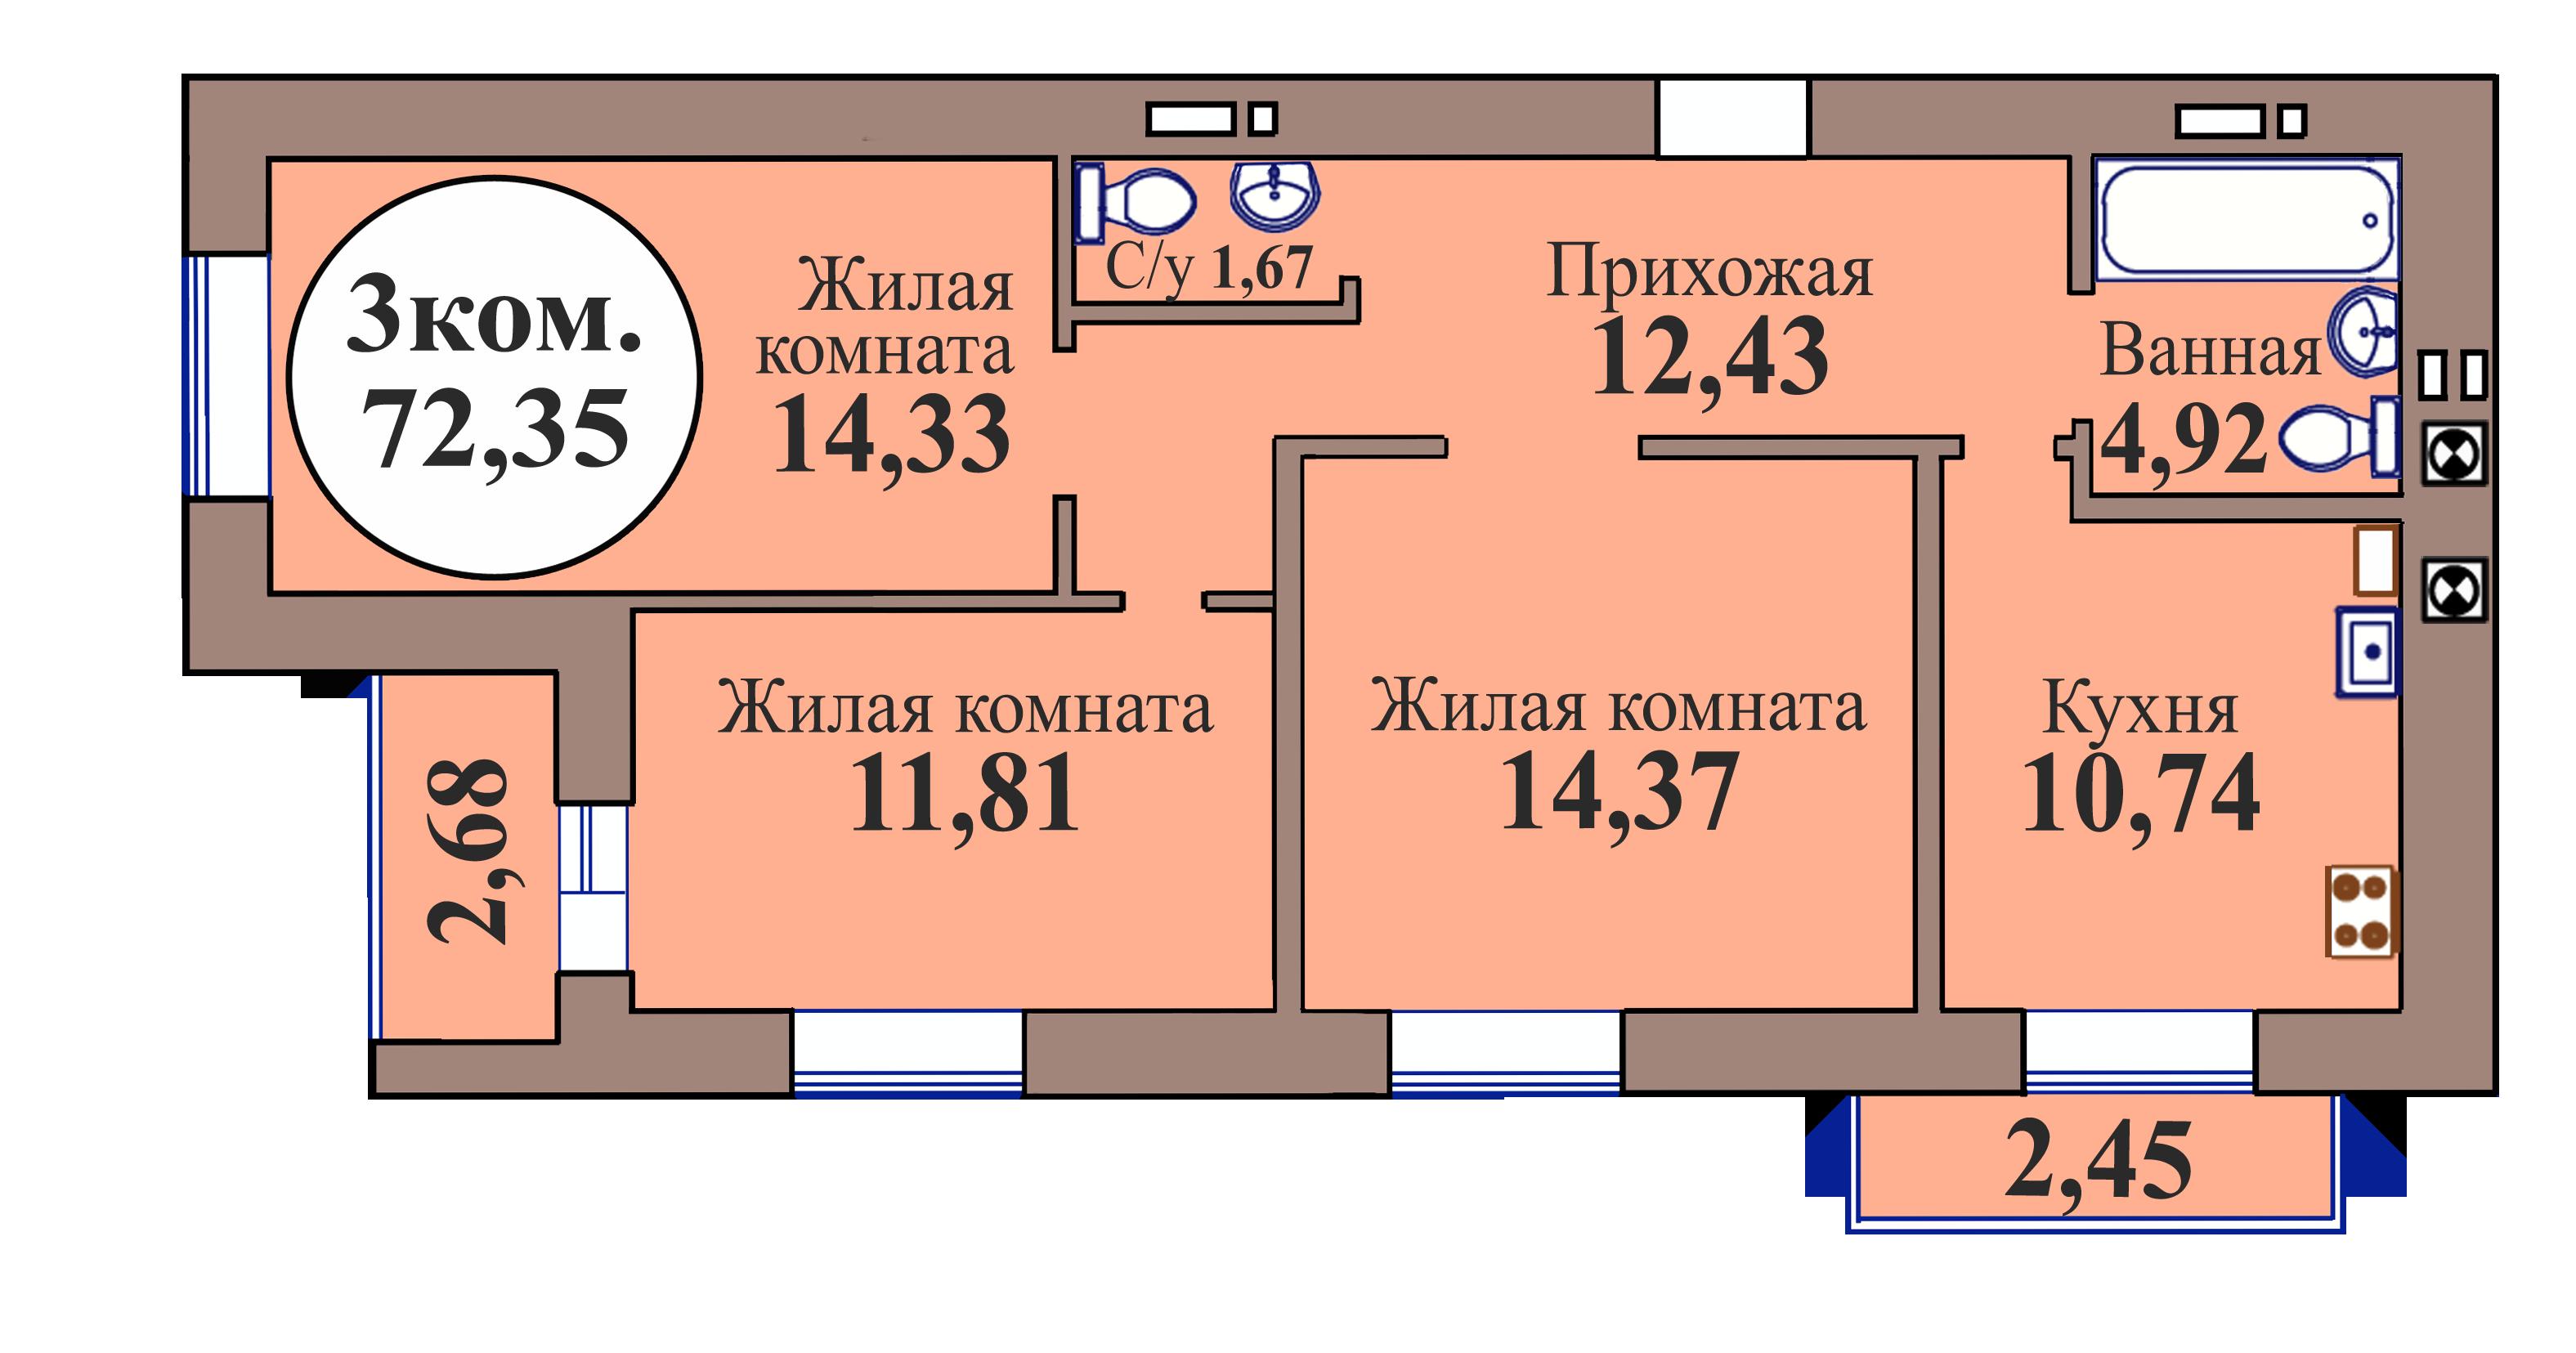 3-комн. кв. по пер. Калининградский, 5 кв. 176 в Калининграде